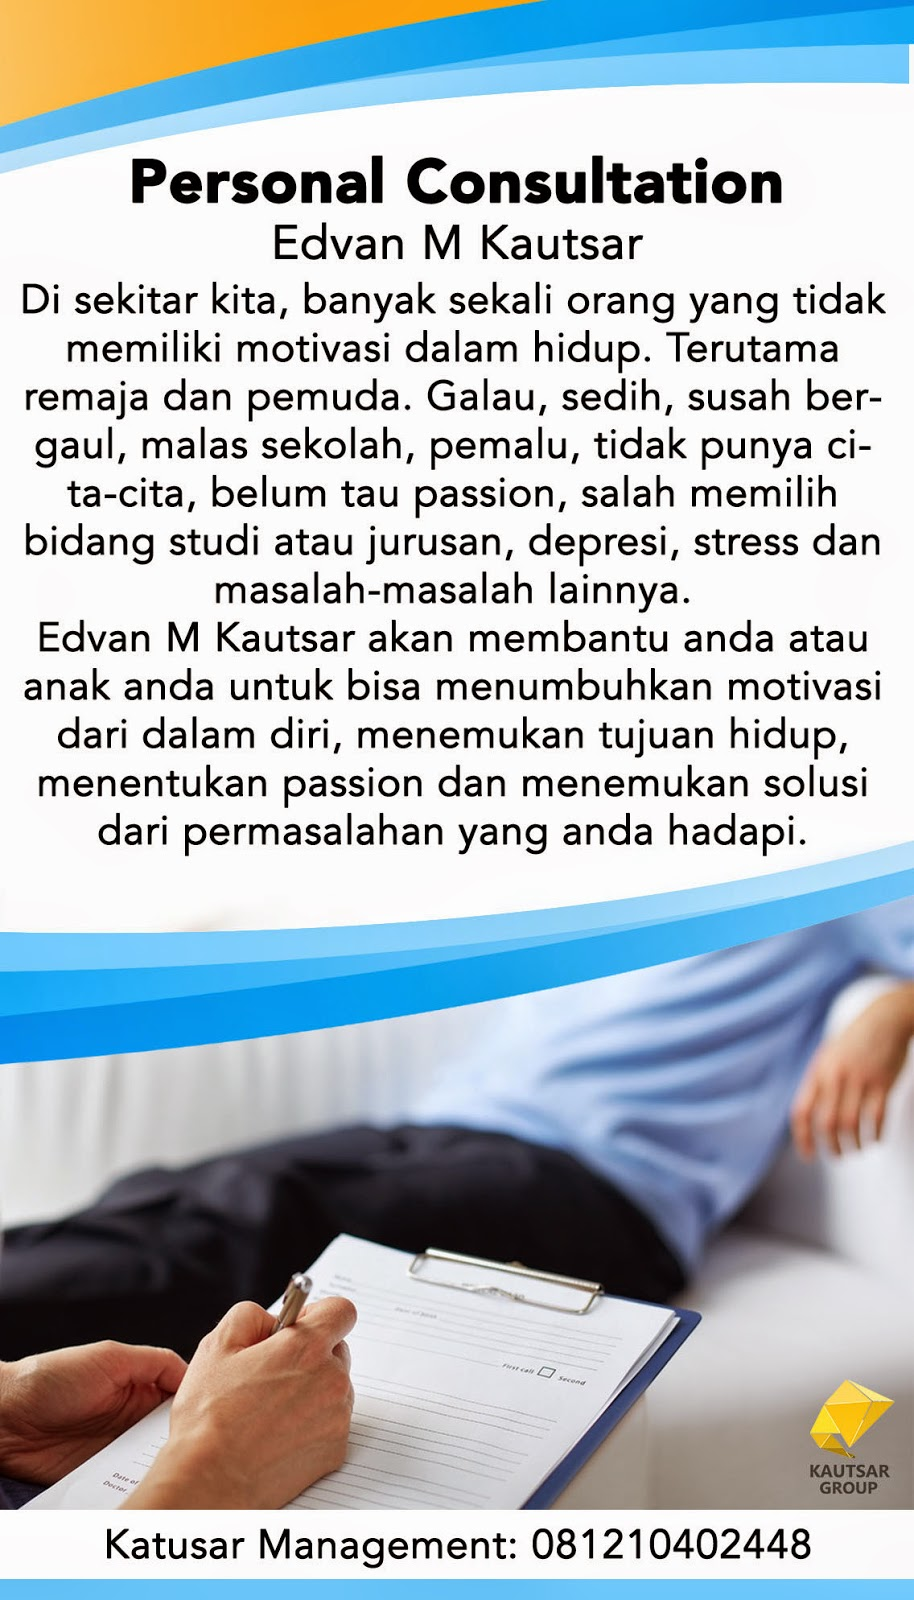 konsultasi, motivasi, private consultation, motivasi pribadi, edvan m kautsar, motivator muda, penulis, motivator terkenal indonesia,